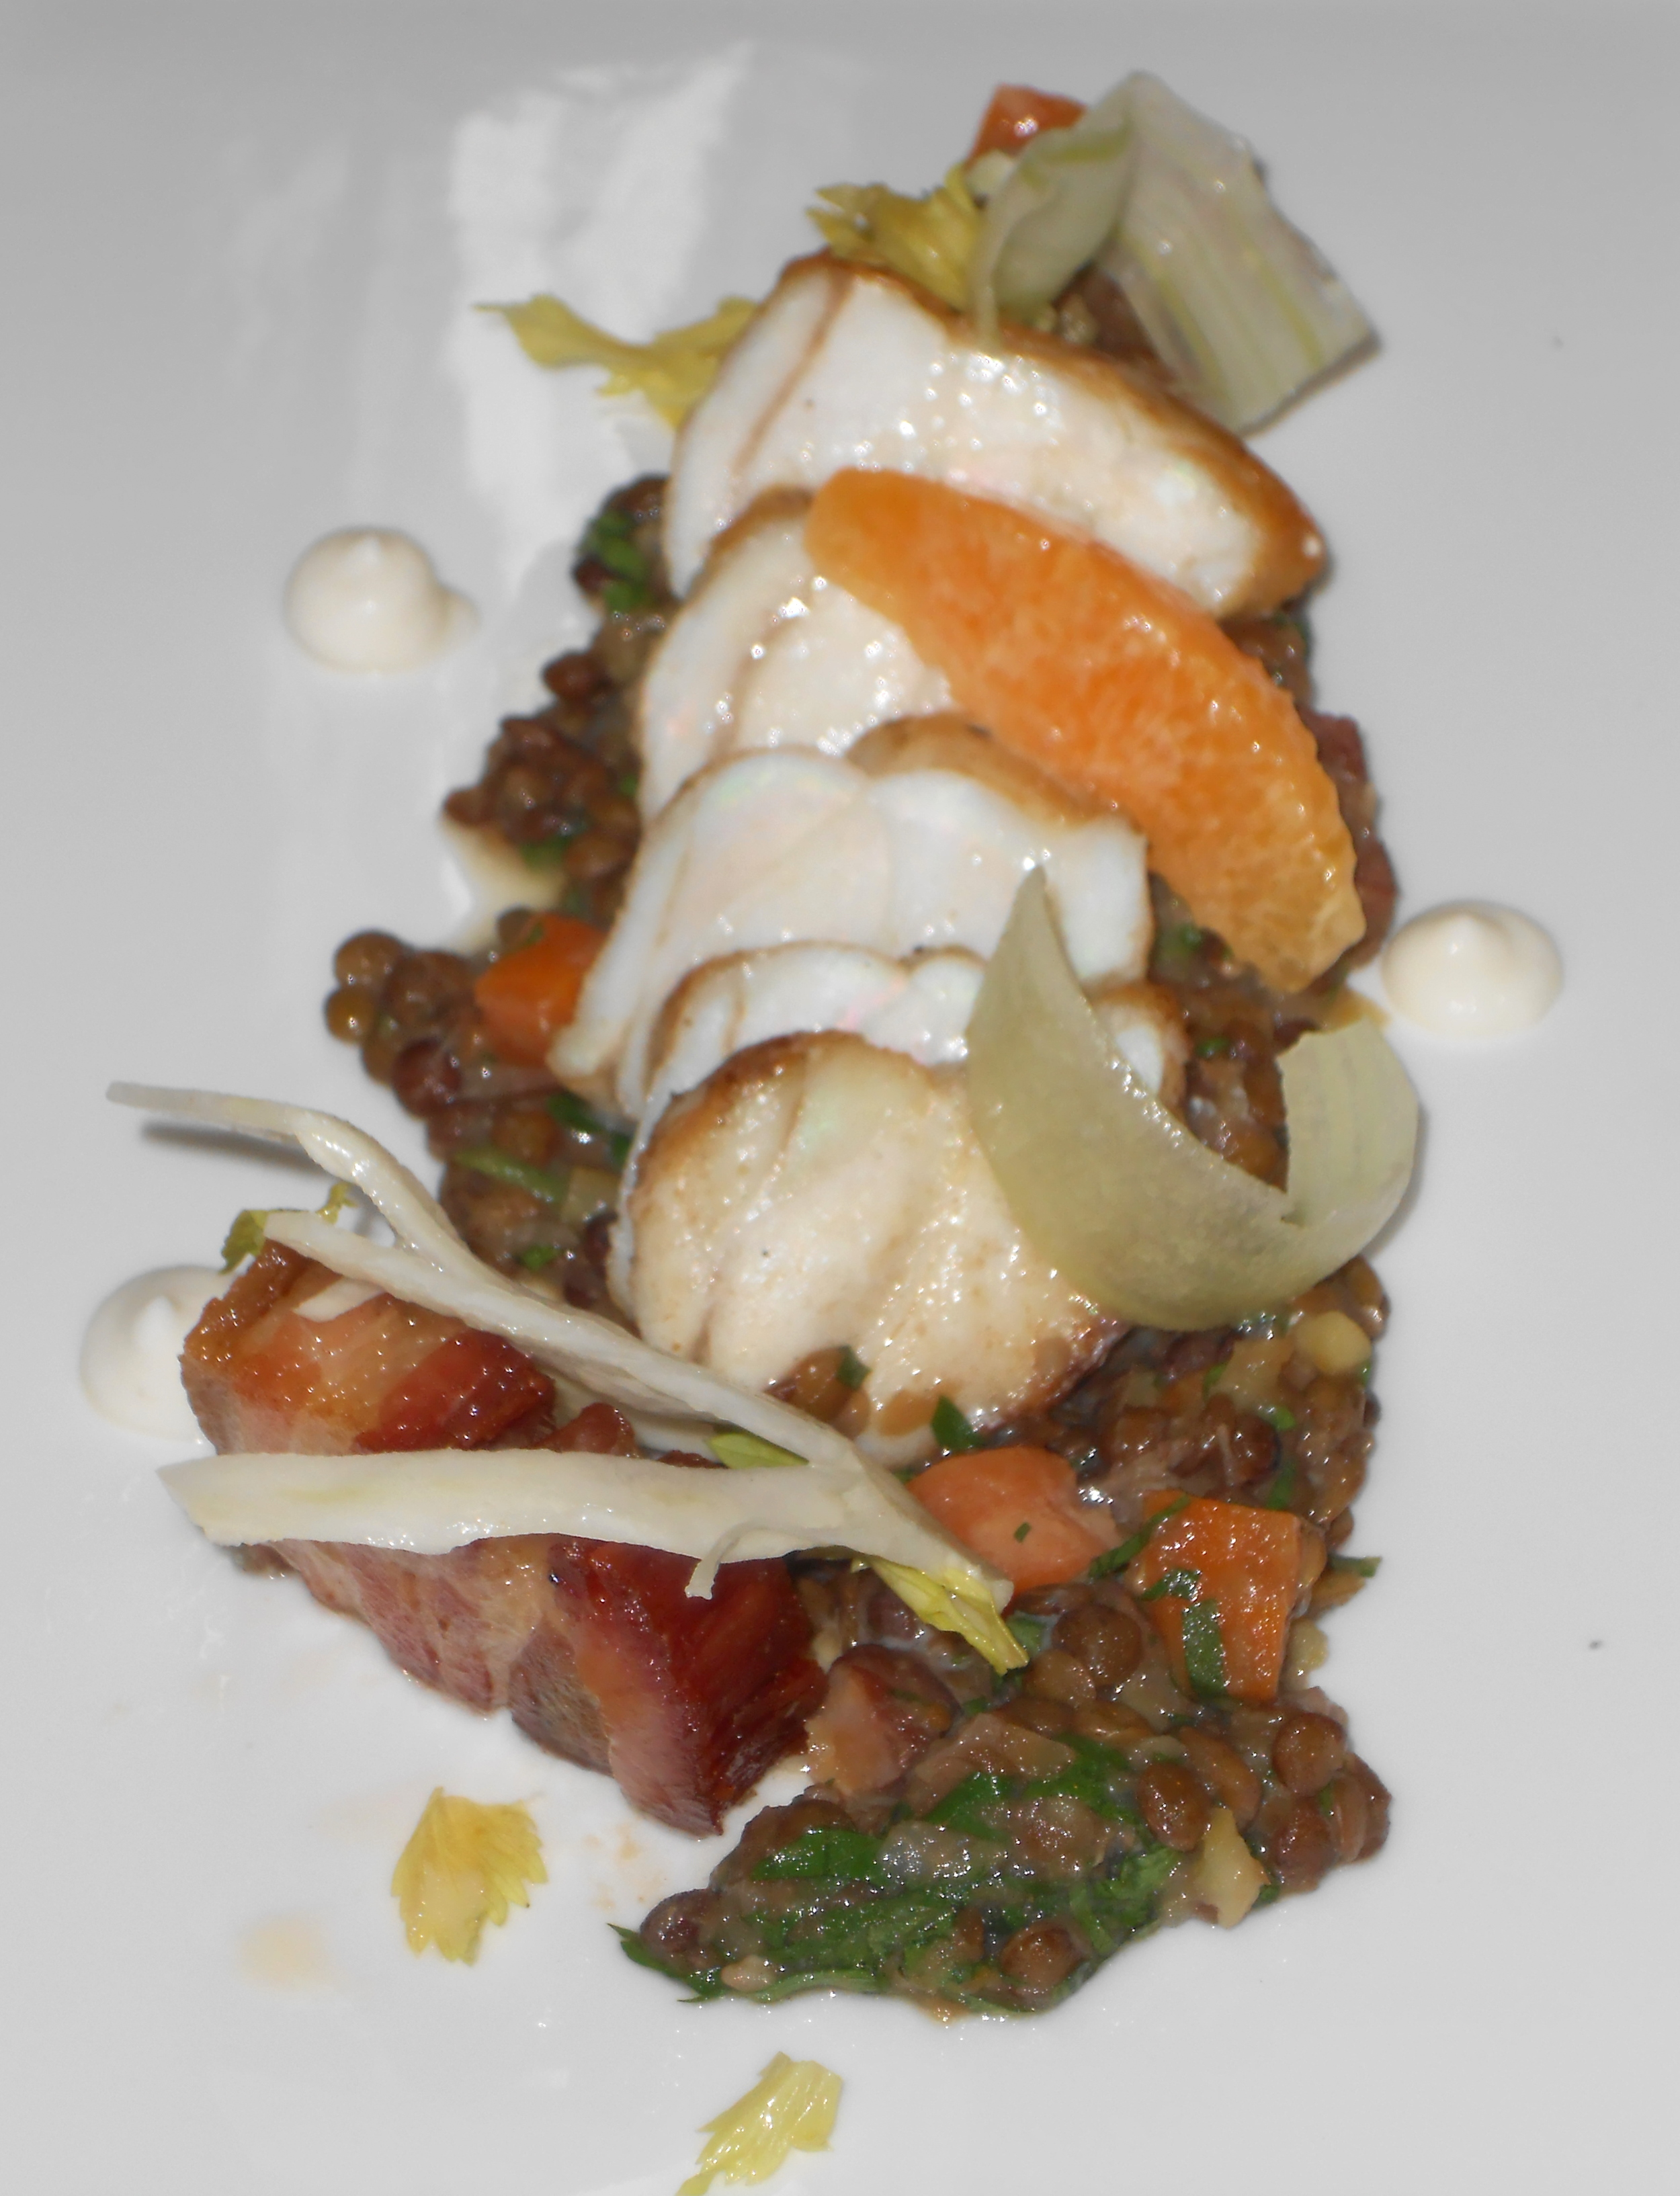 Monkfish loin with lentils du puy, pork belly, sunchoke, petite carrot, cara cara orange, and celery salad